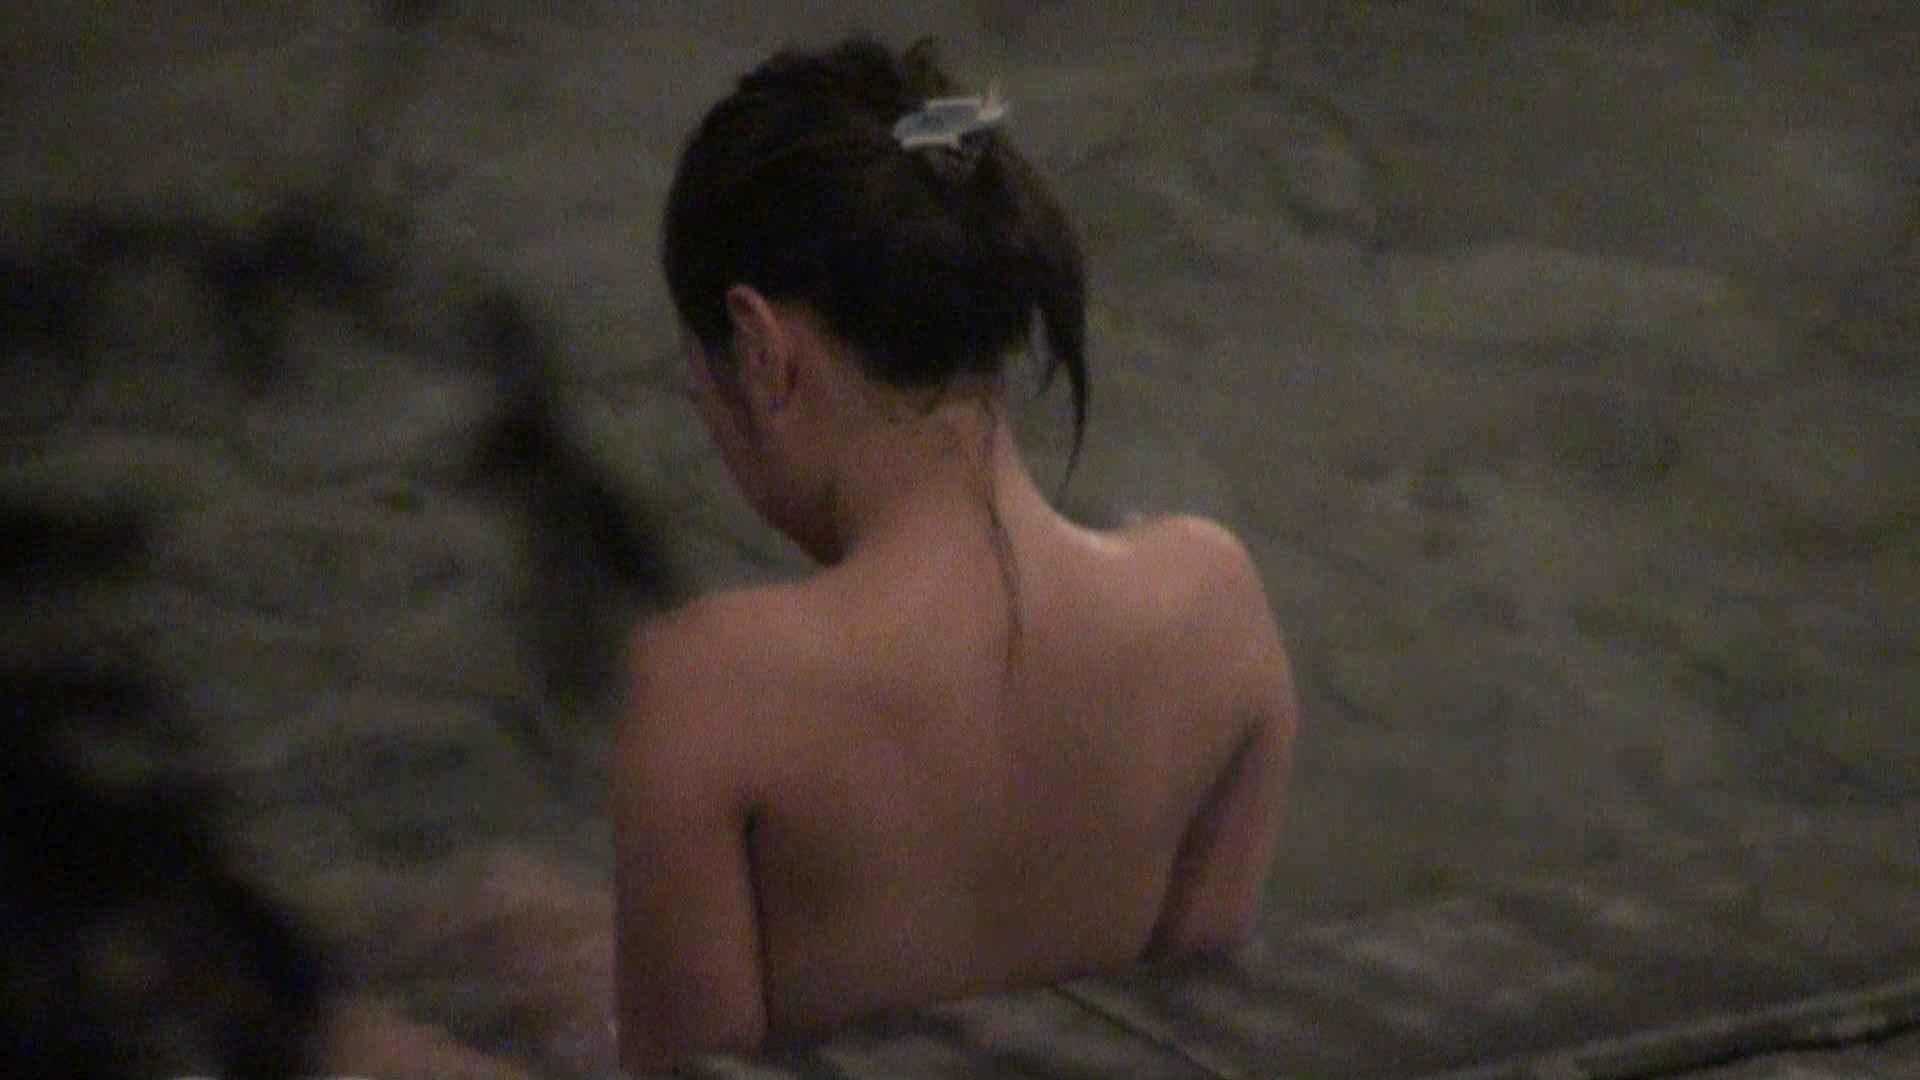 Aquaな露天風呂Vol.407 0  88連発 84